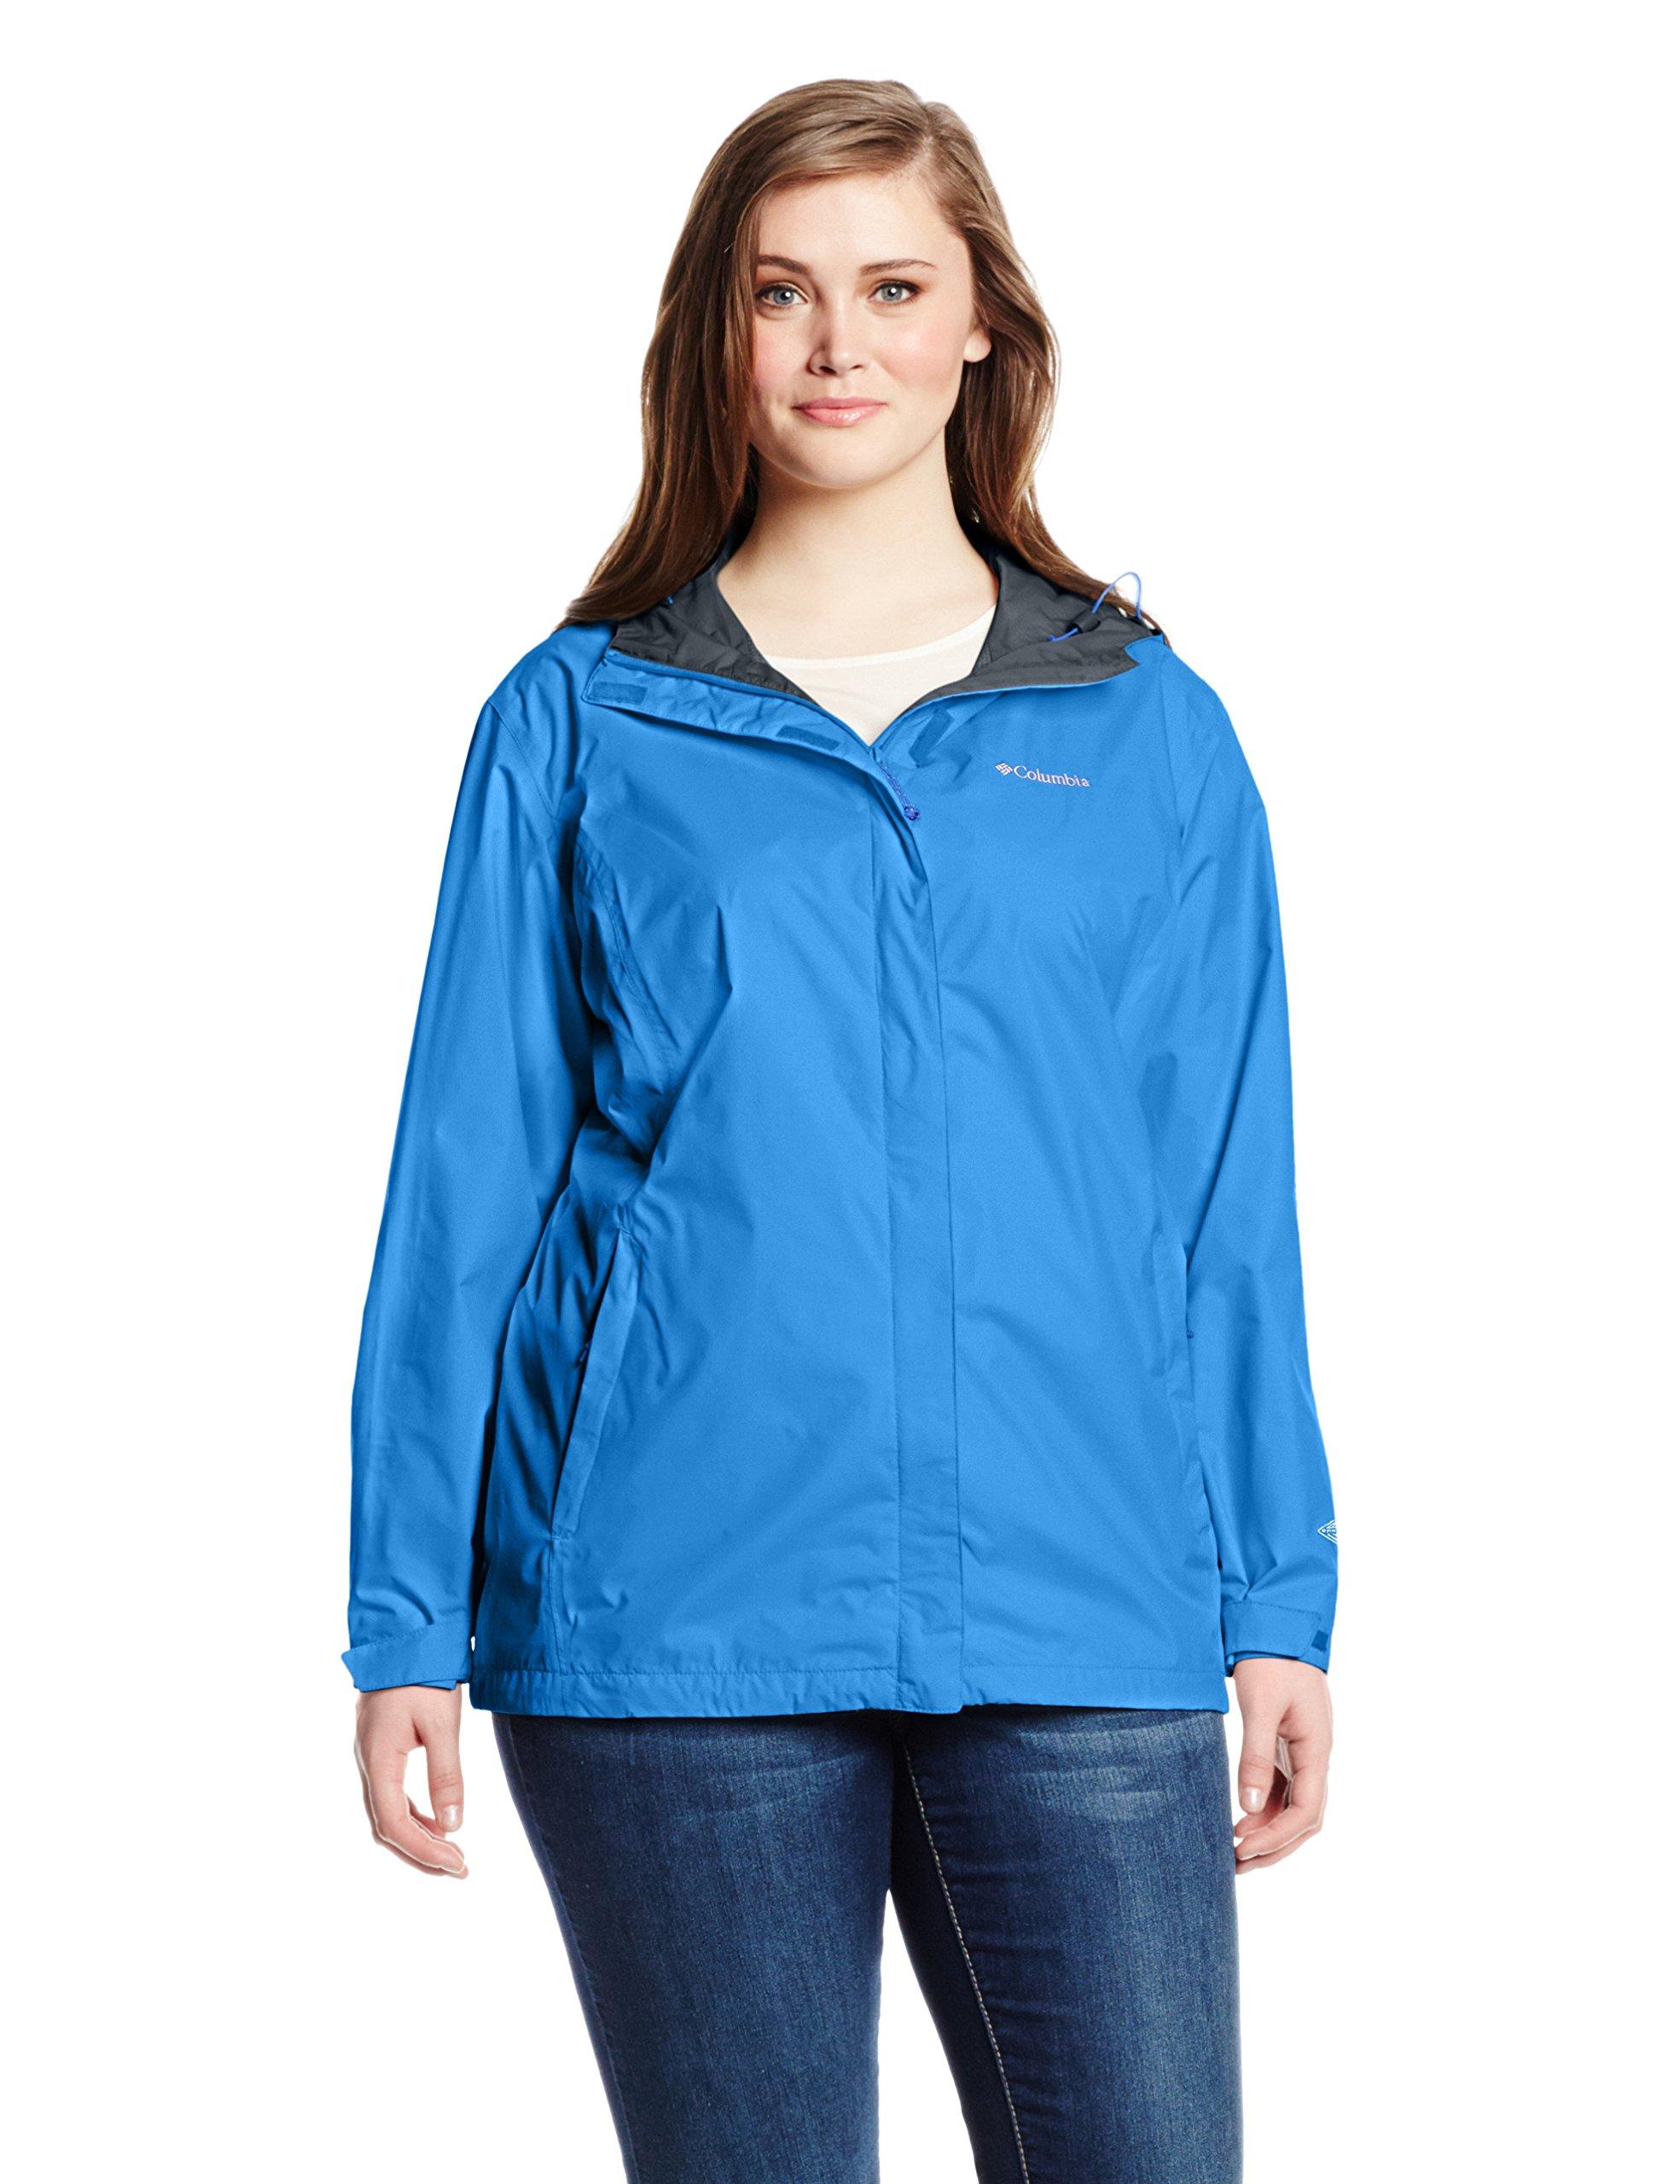 Columbia Women's Plus-Size Arcadia II Jacket, Stormy Blue, 1X